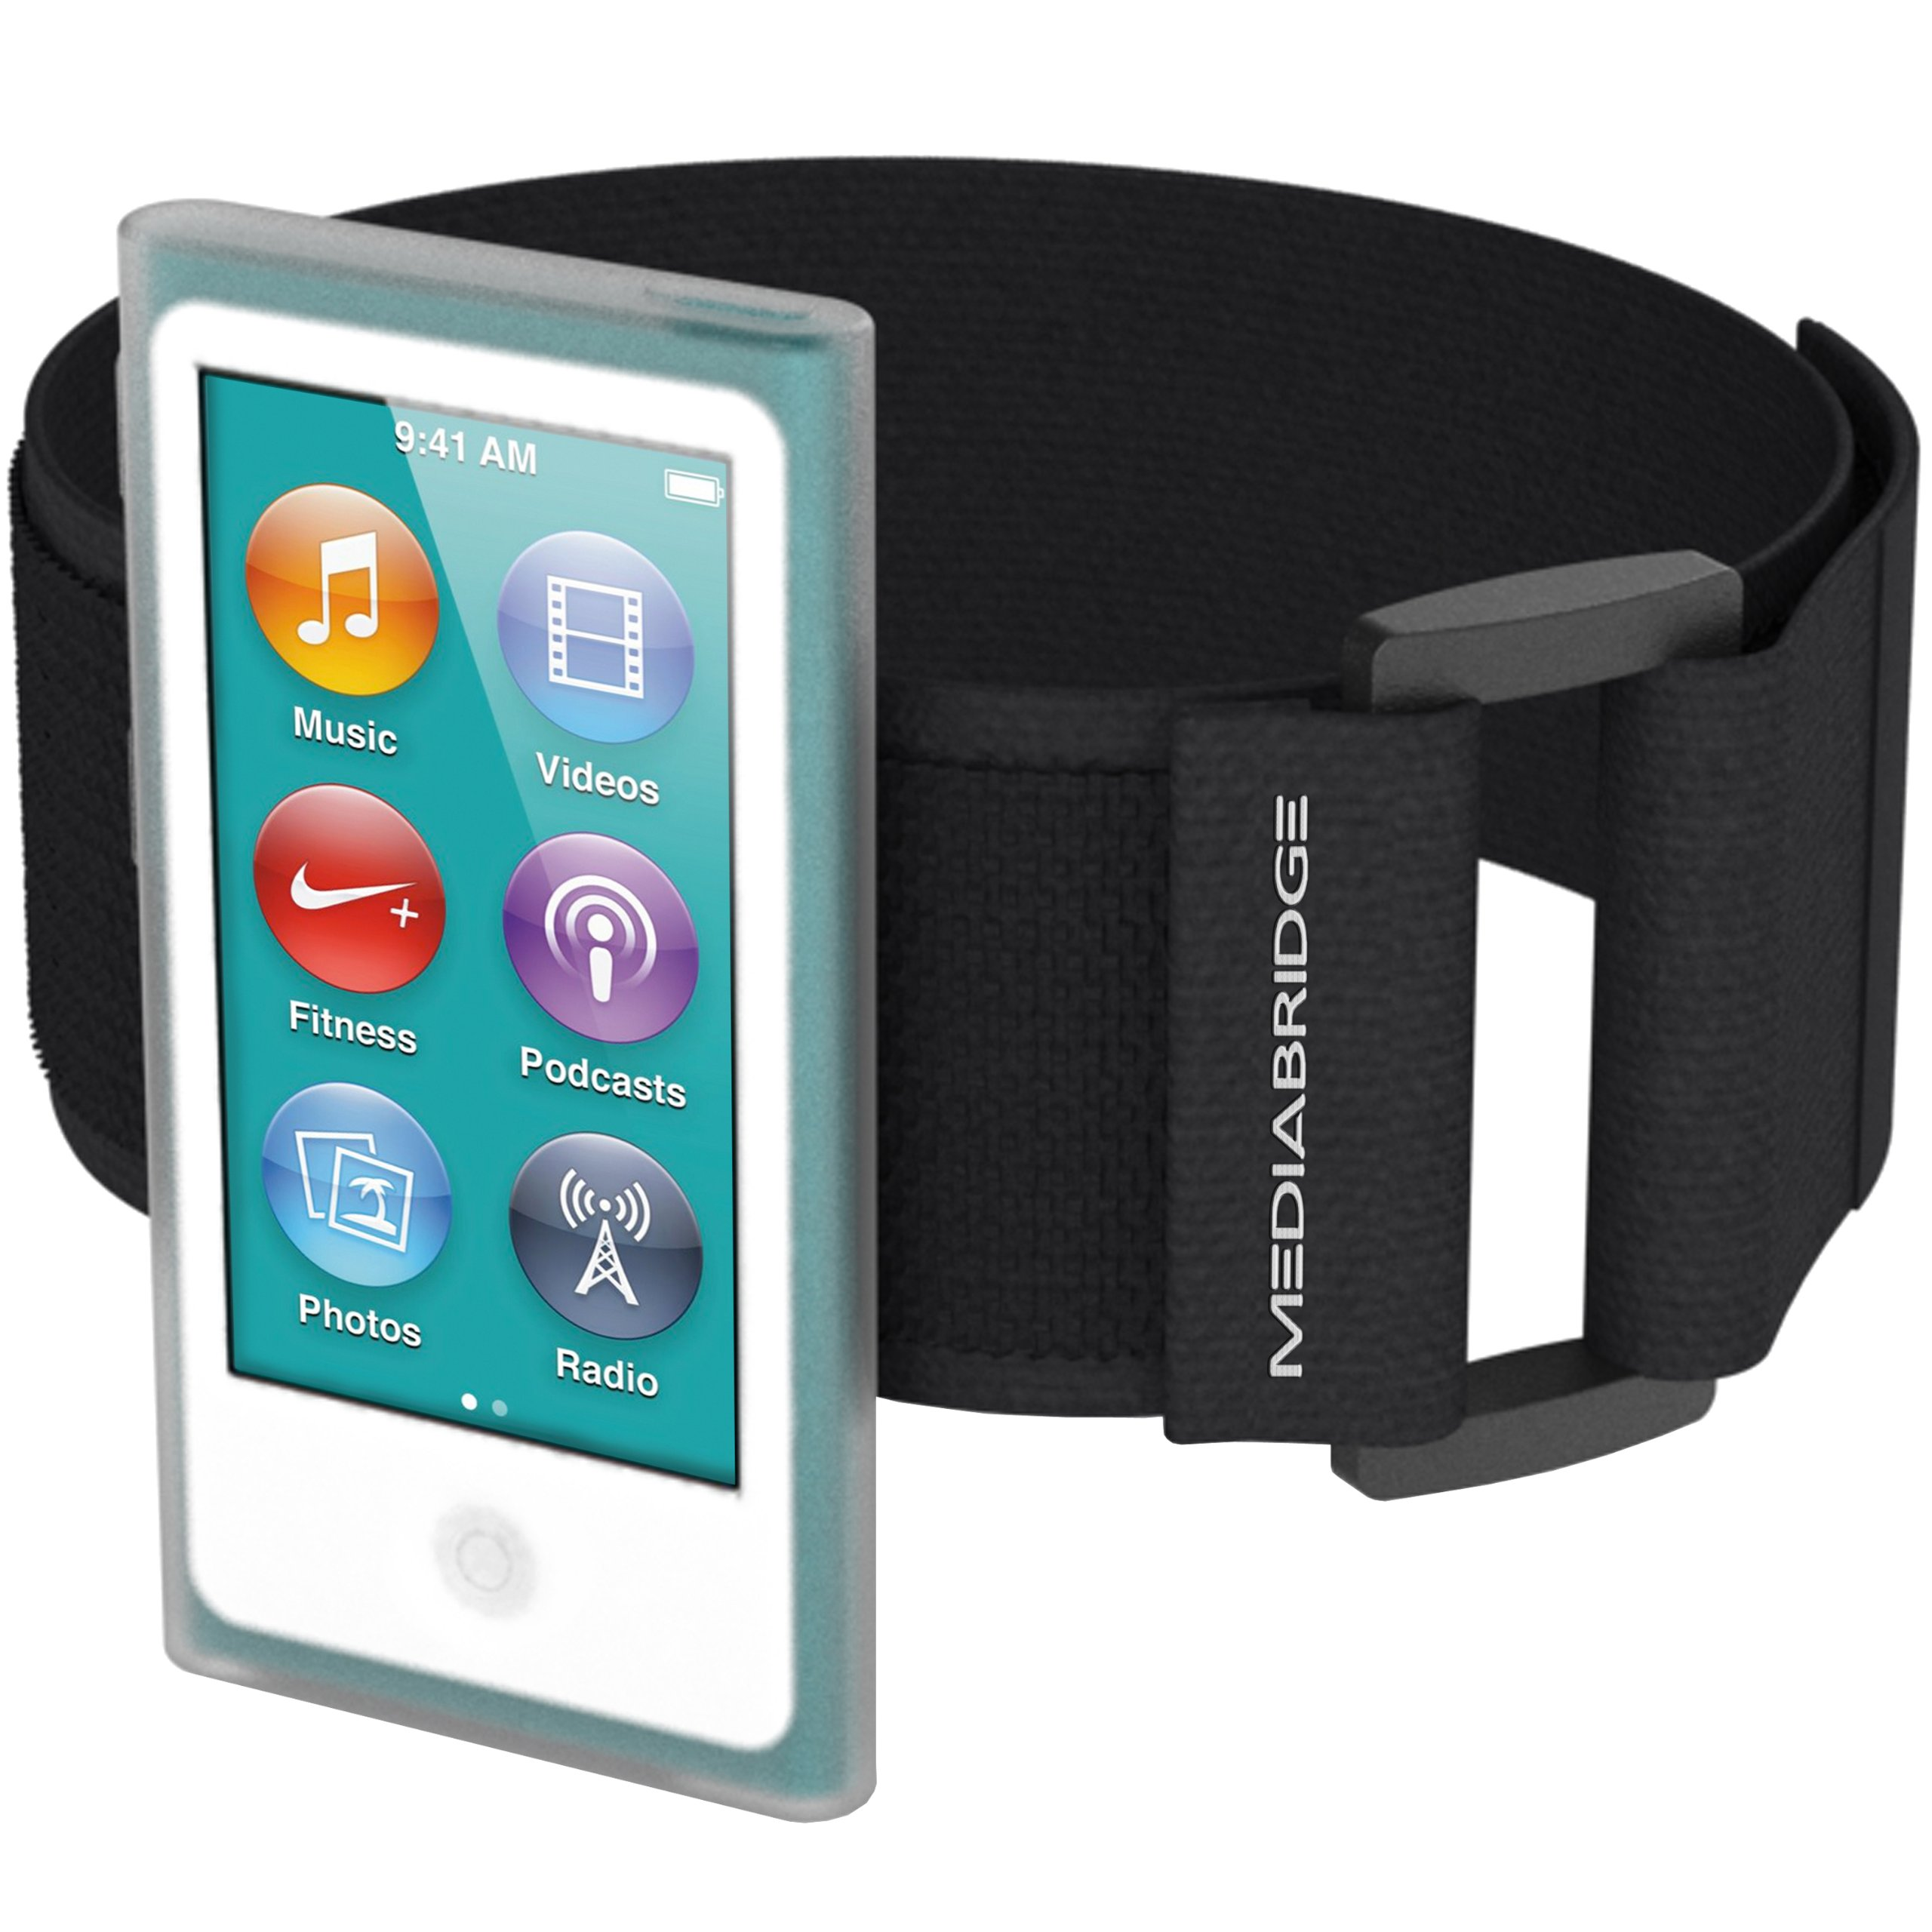 Armband for iPod Nano - 7th Generation / 8th Generation ( Clear ) - Model AB1 by Mediabridge (Part# AB1-IPN7-CLEAR )